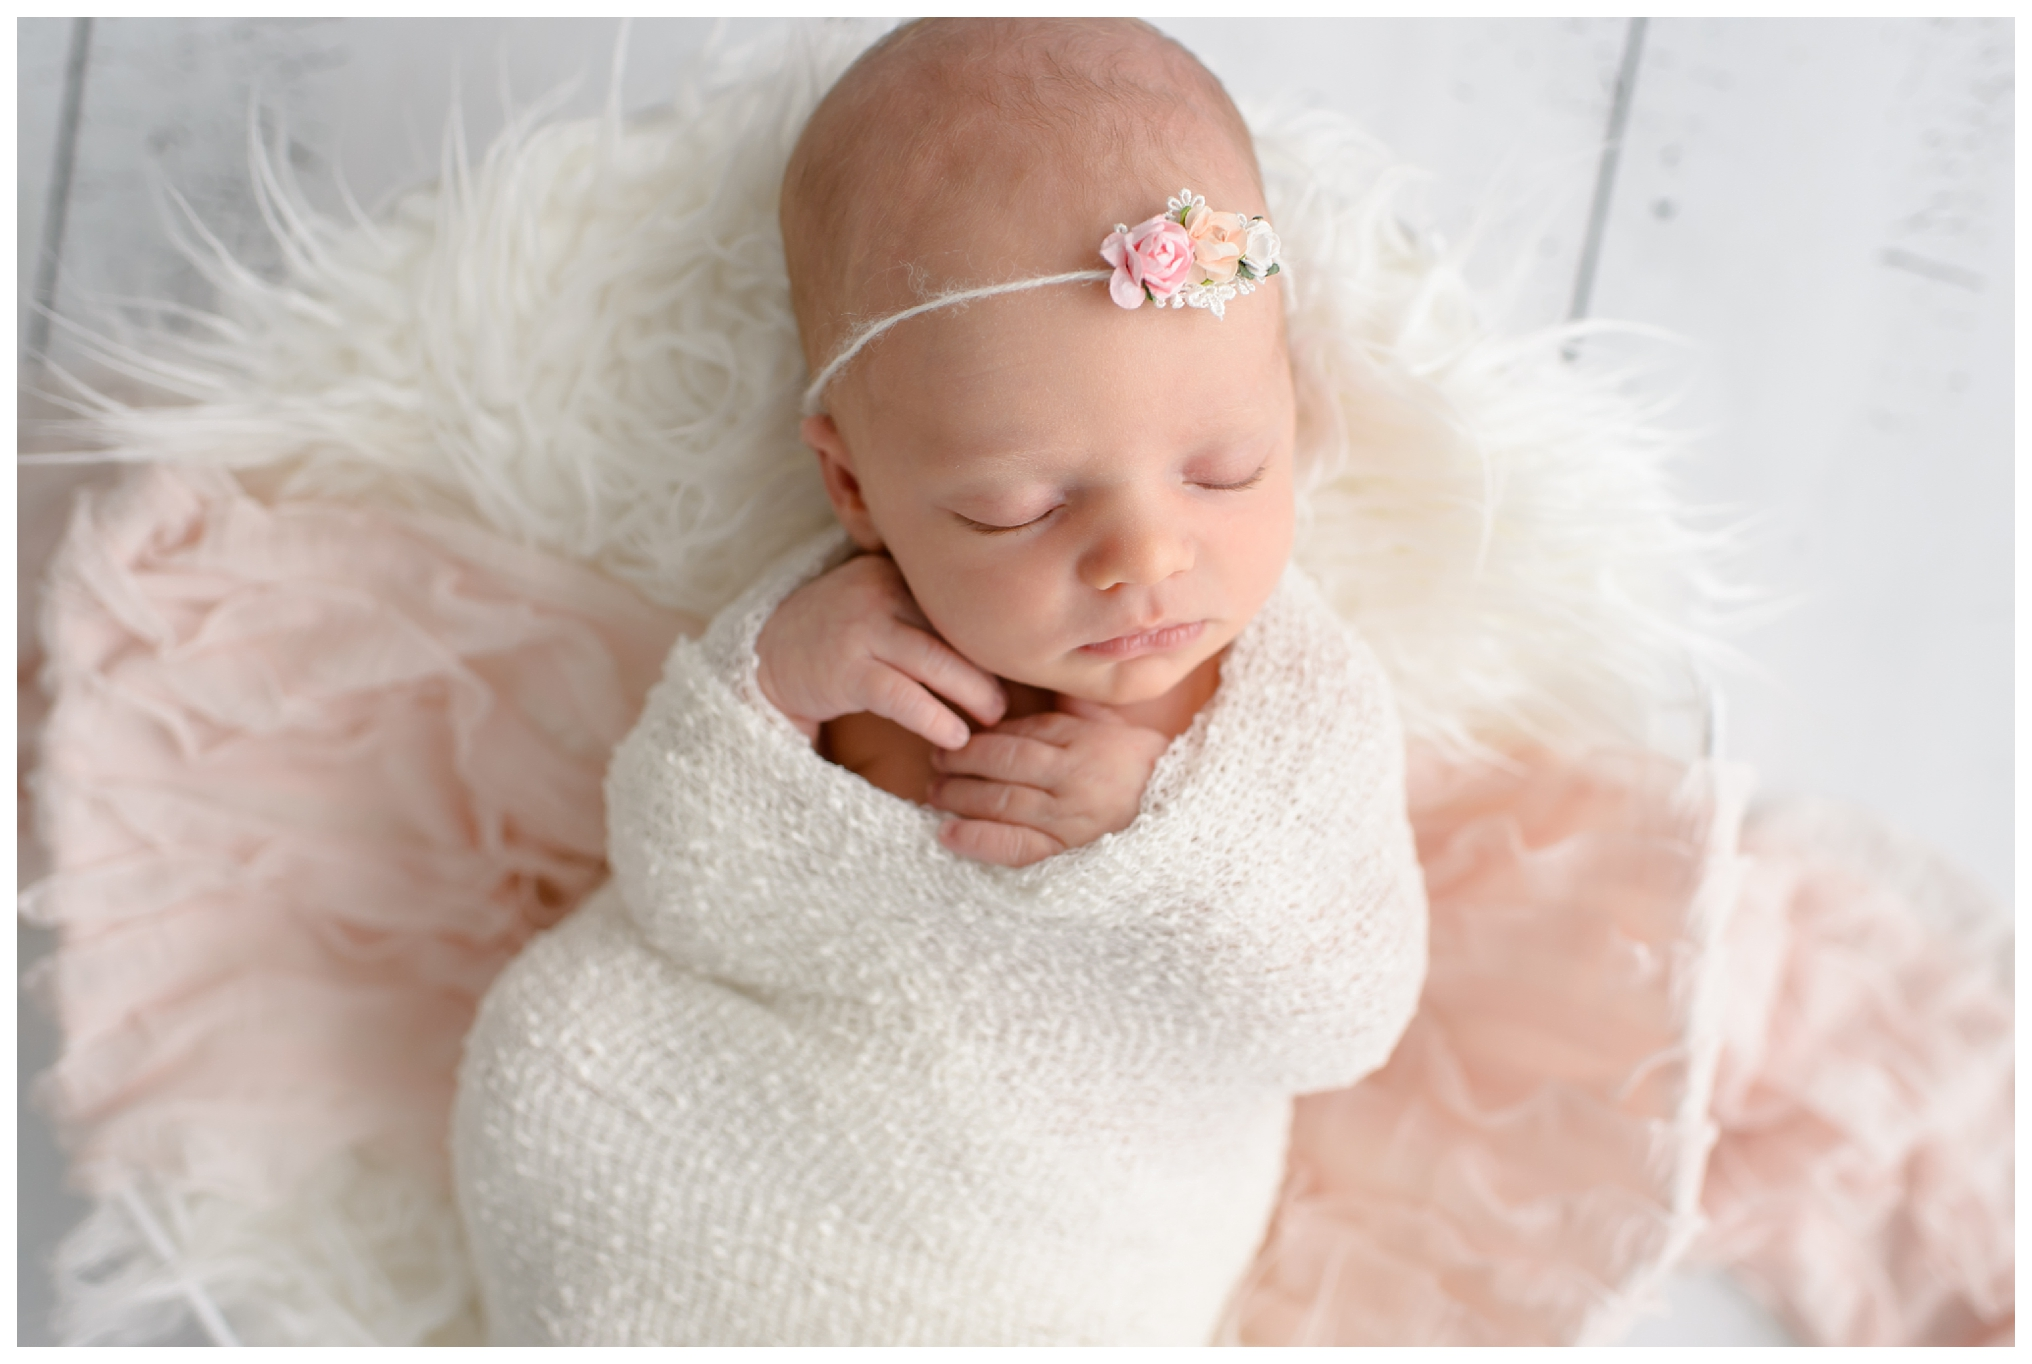 Newborn-Photographer-Sweet_Light-Portraits_0564.jpg